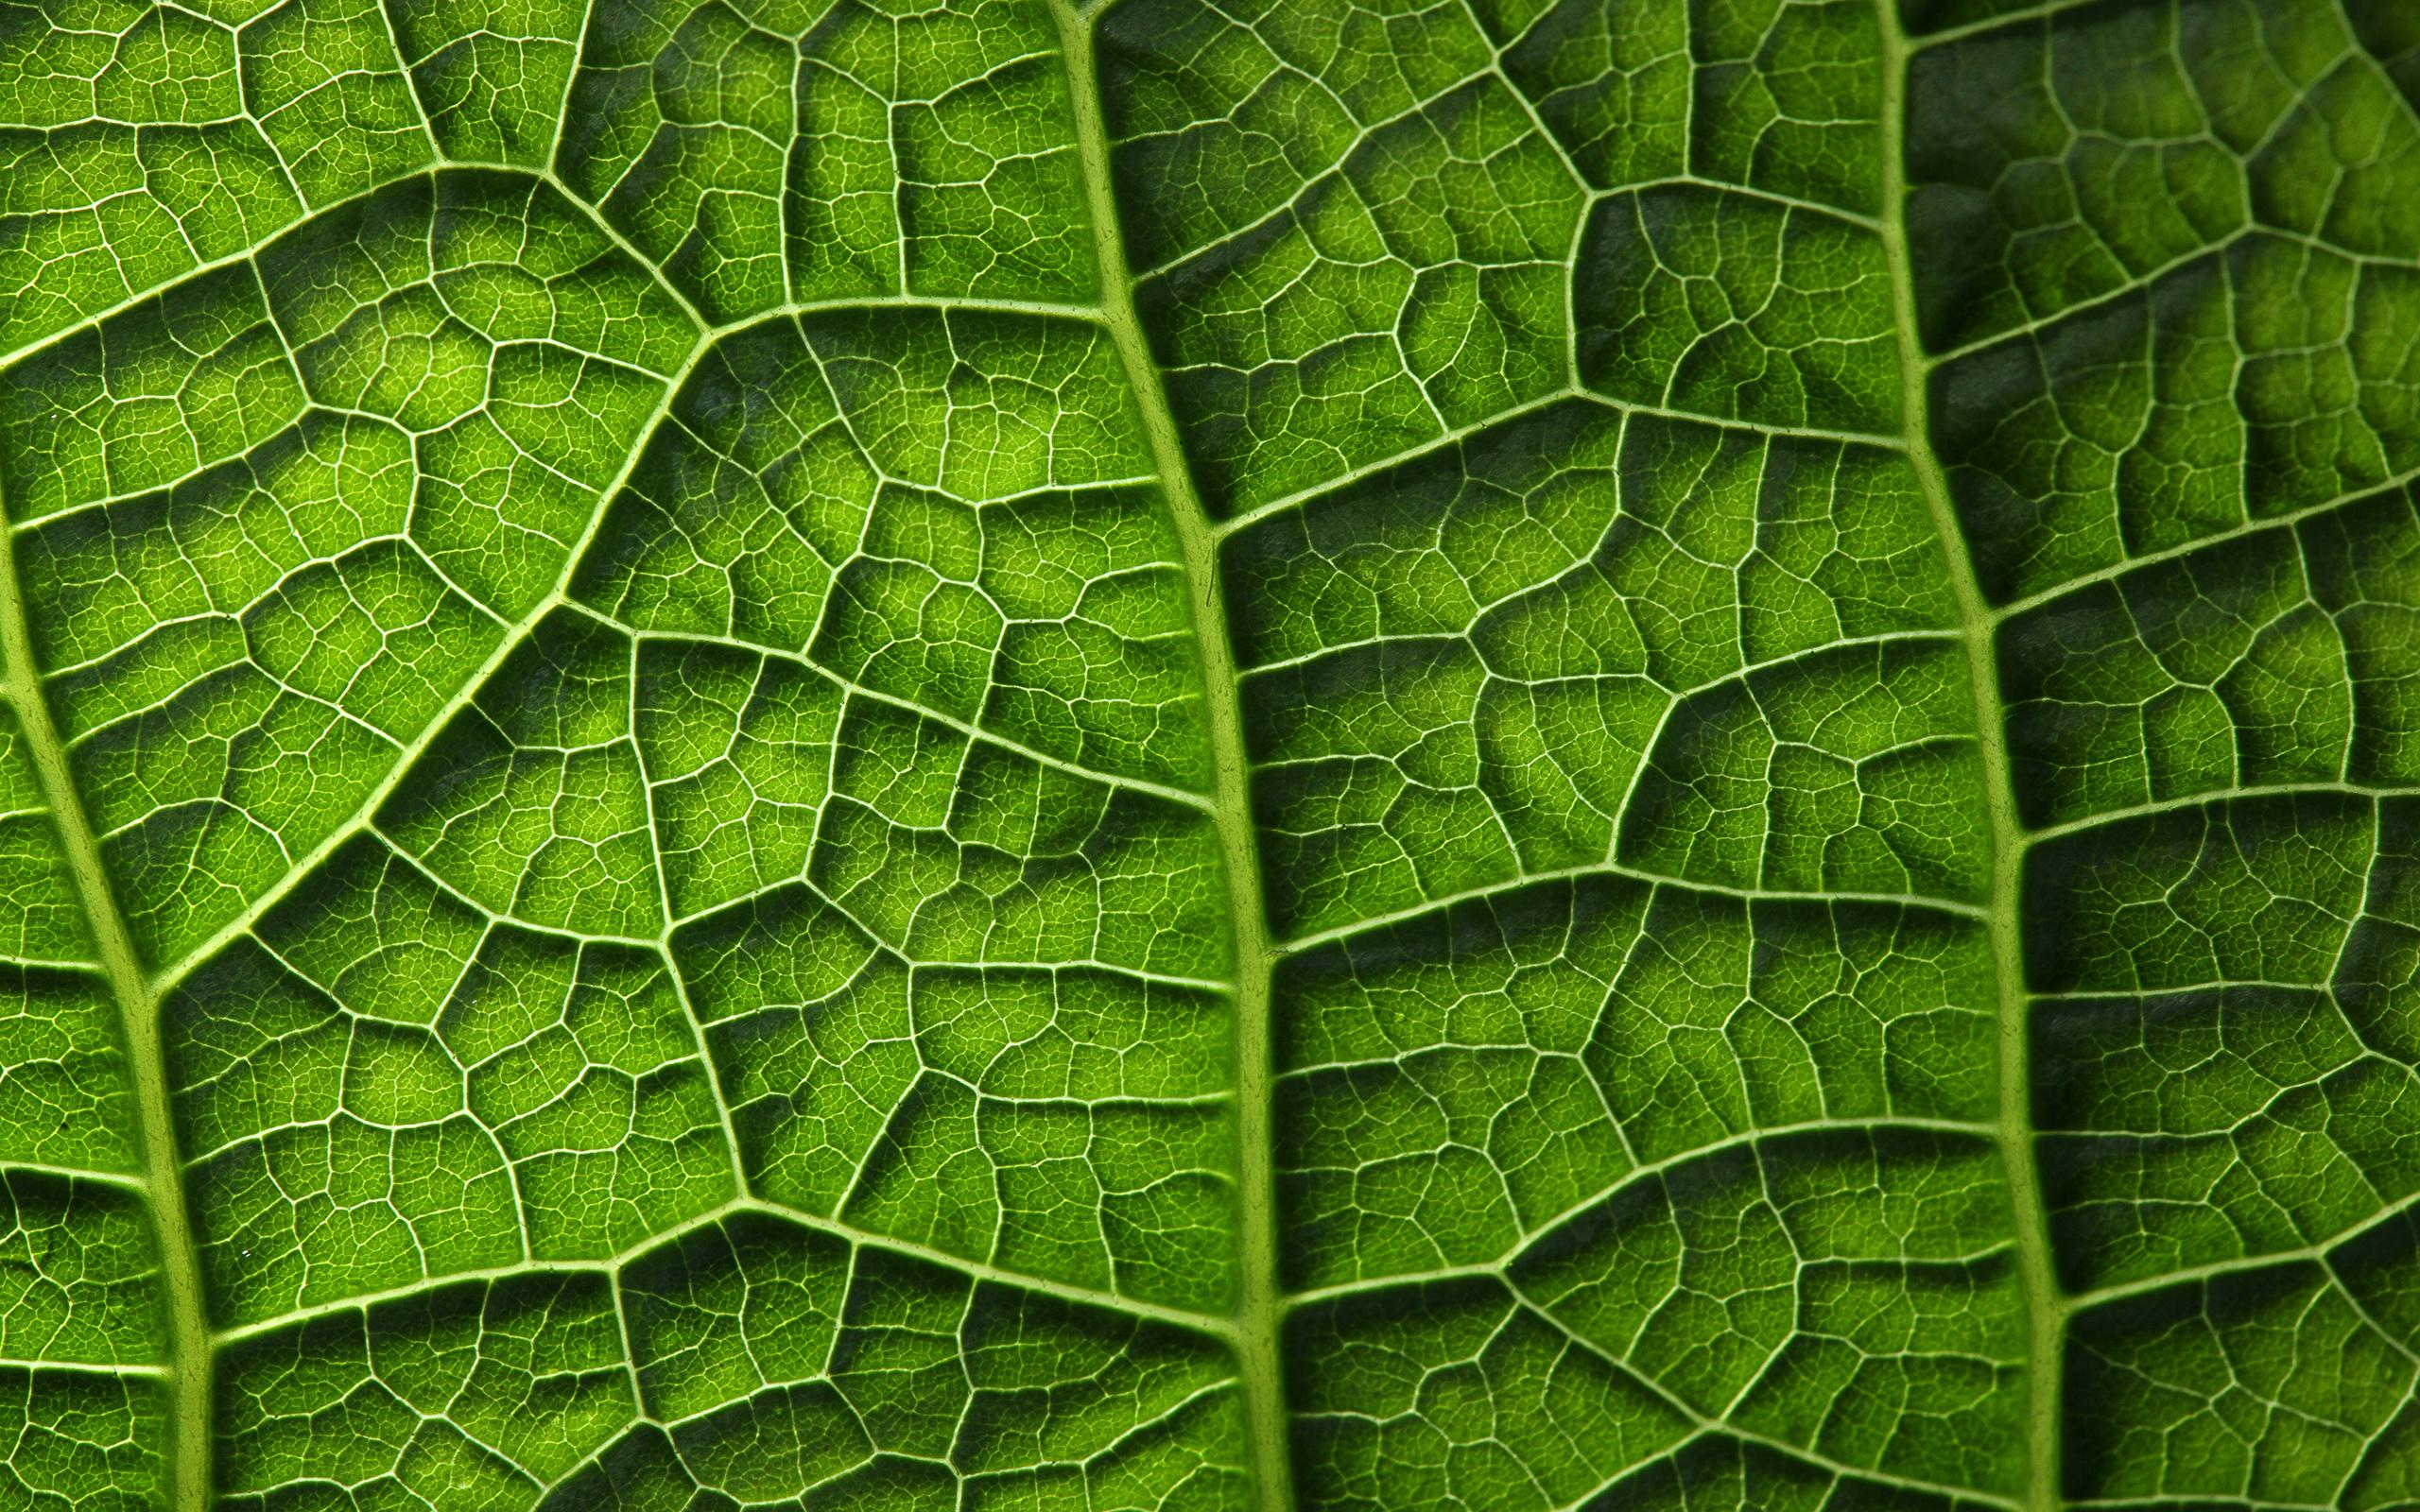 Image Foliage Texture Green Nature Macro Closeup 2560x1600